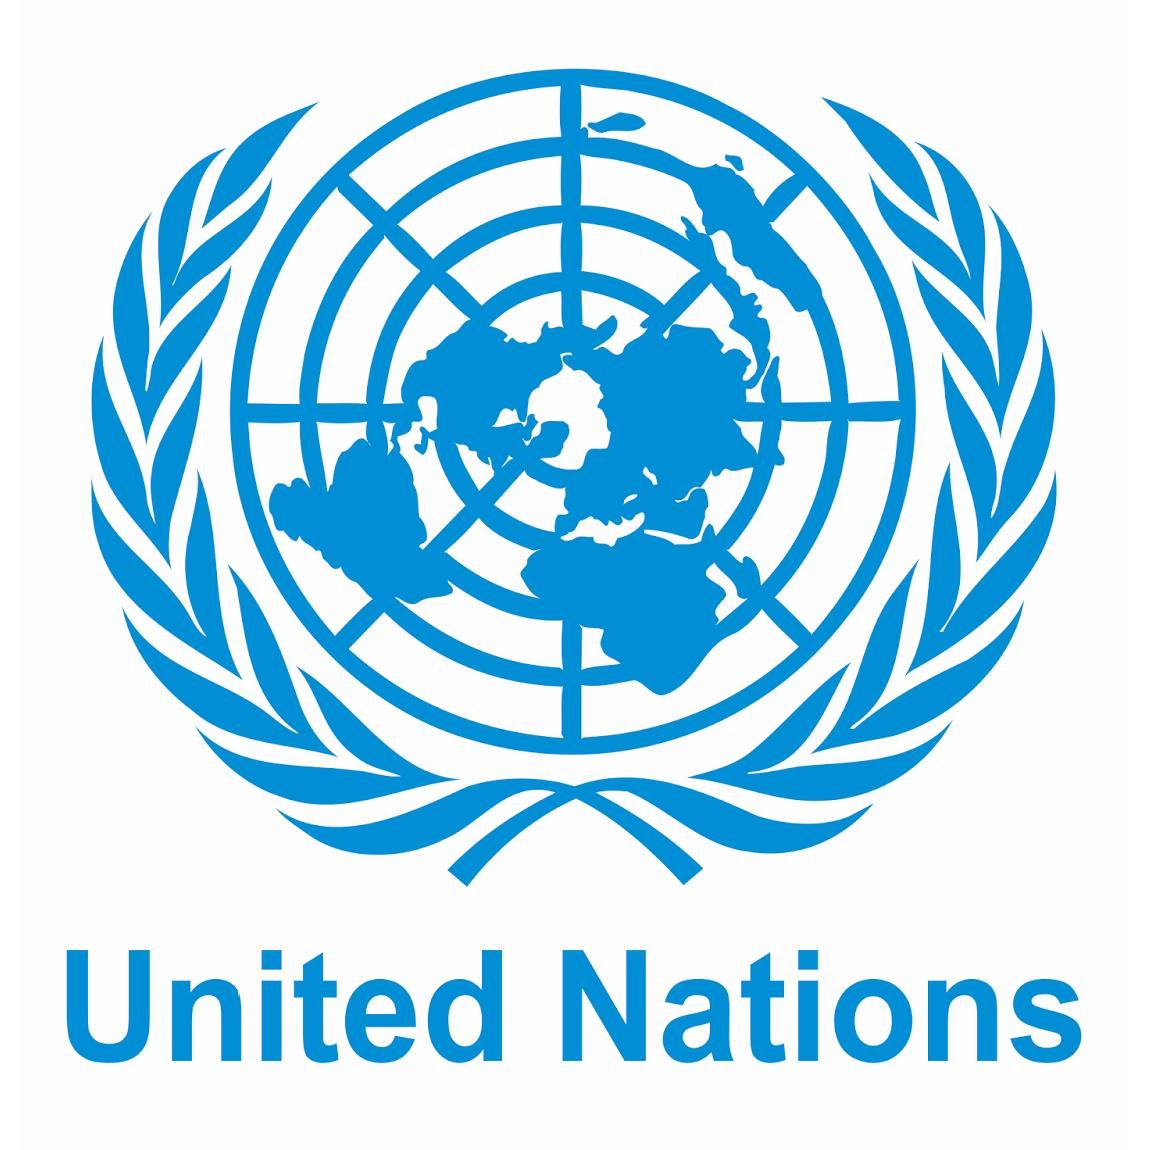 https://skaitech.al/wp-content/uploads/2021/08/ON-logo-1.png